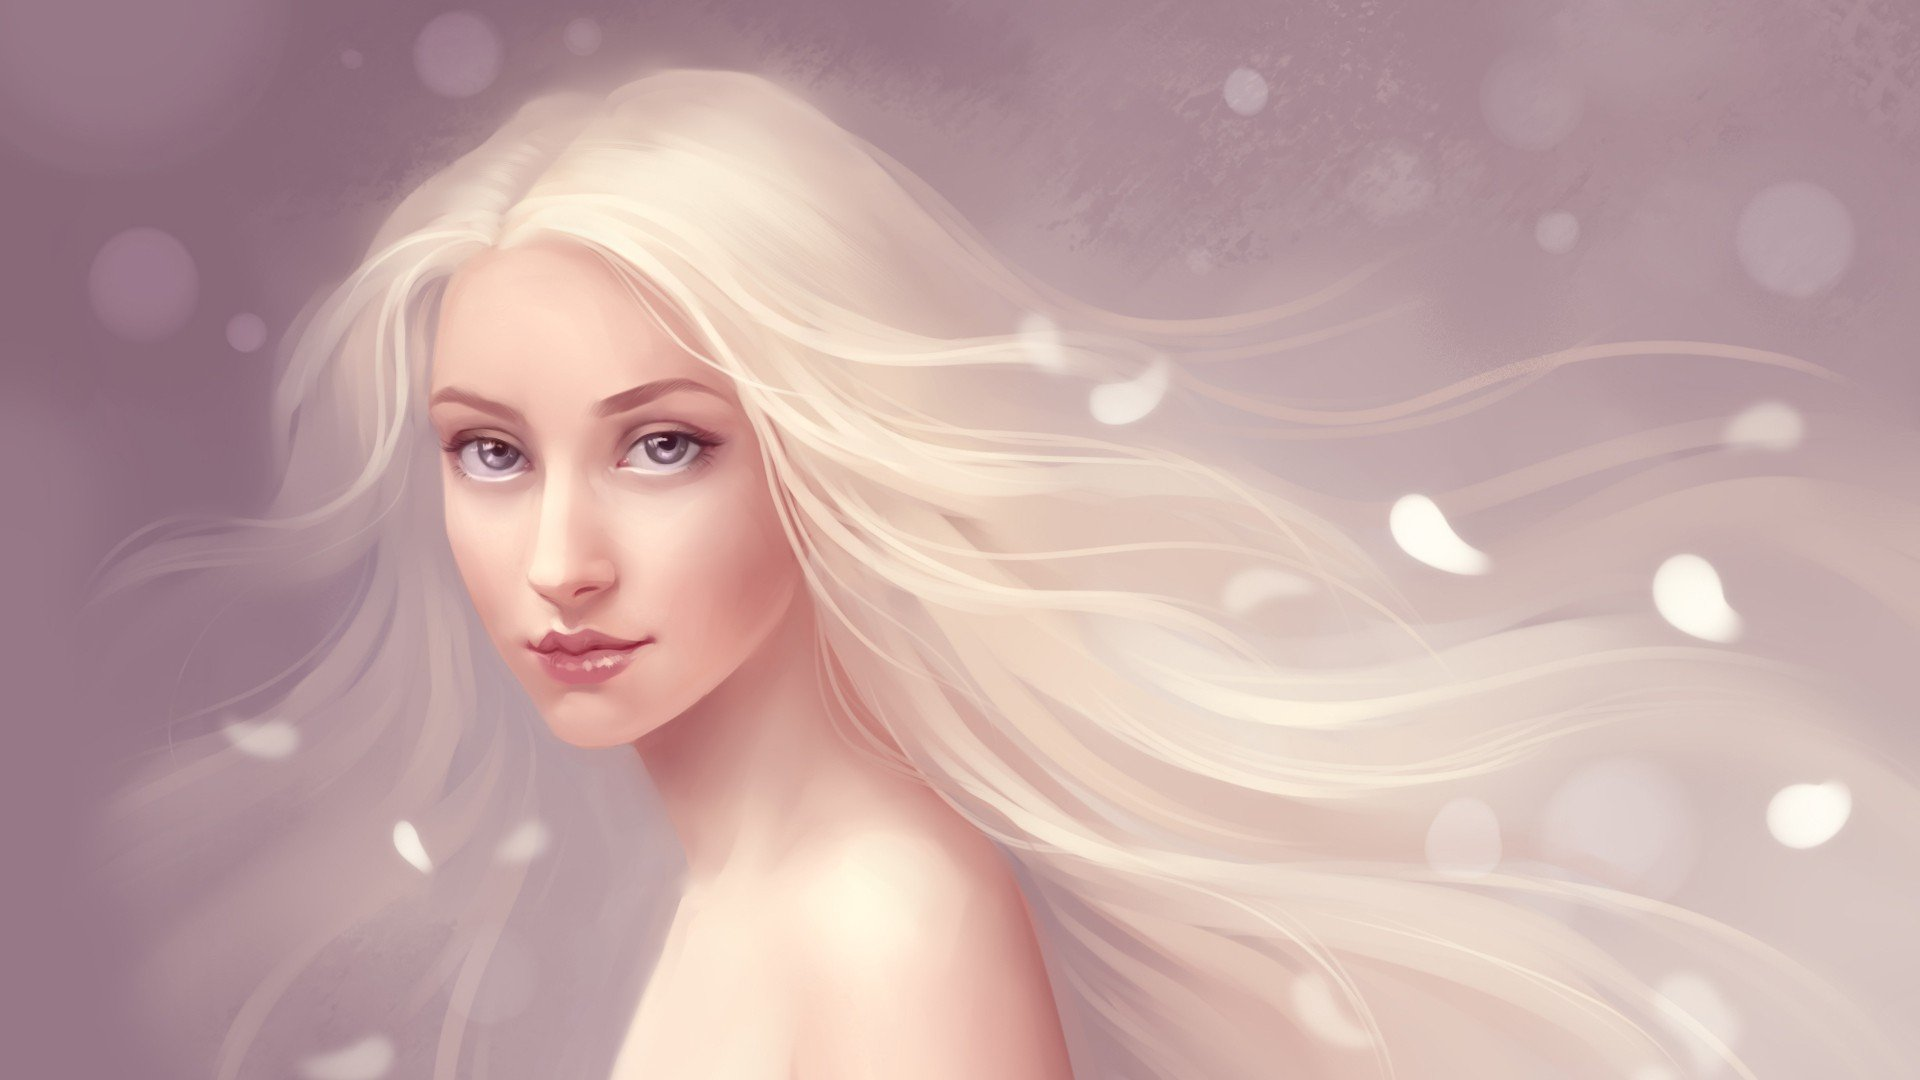 Women fantasy art wallpaper | 1920x1080 | 327803 | WallpaperUP  Women fantasy a...